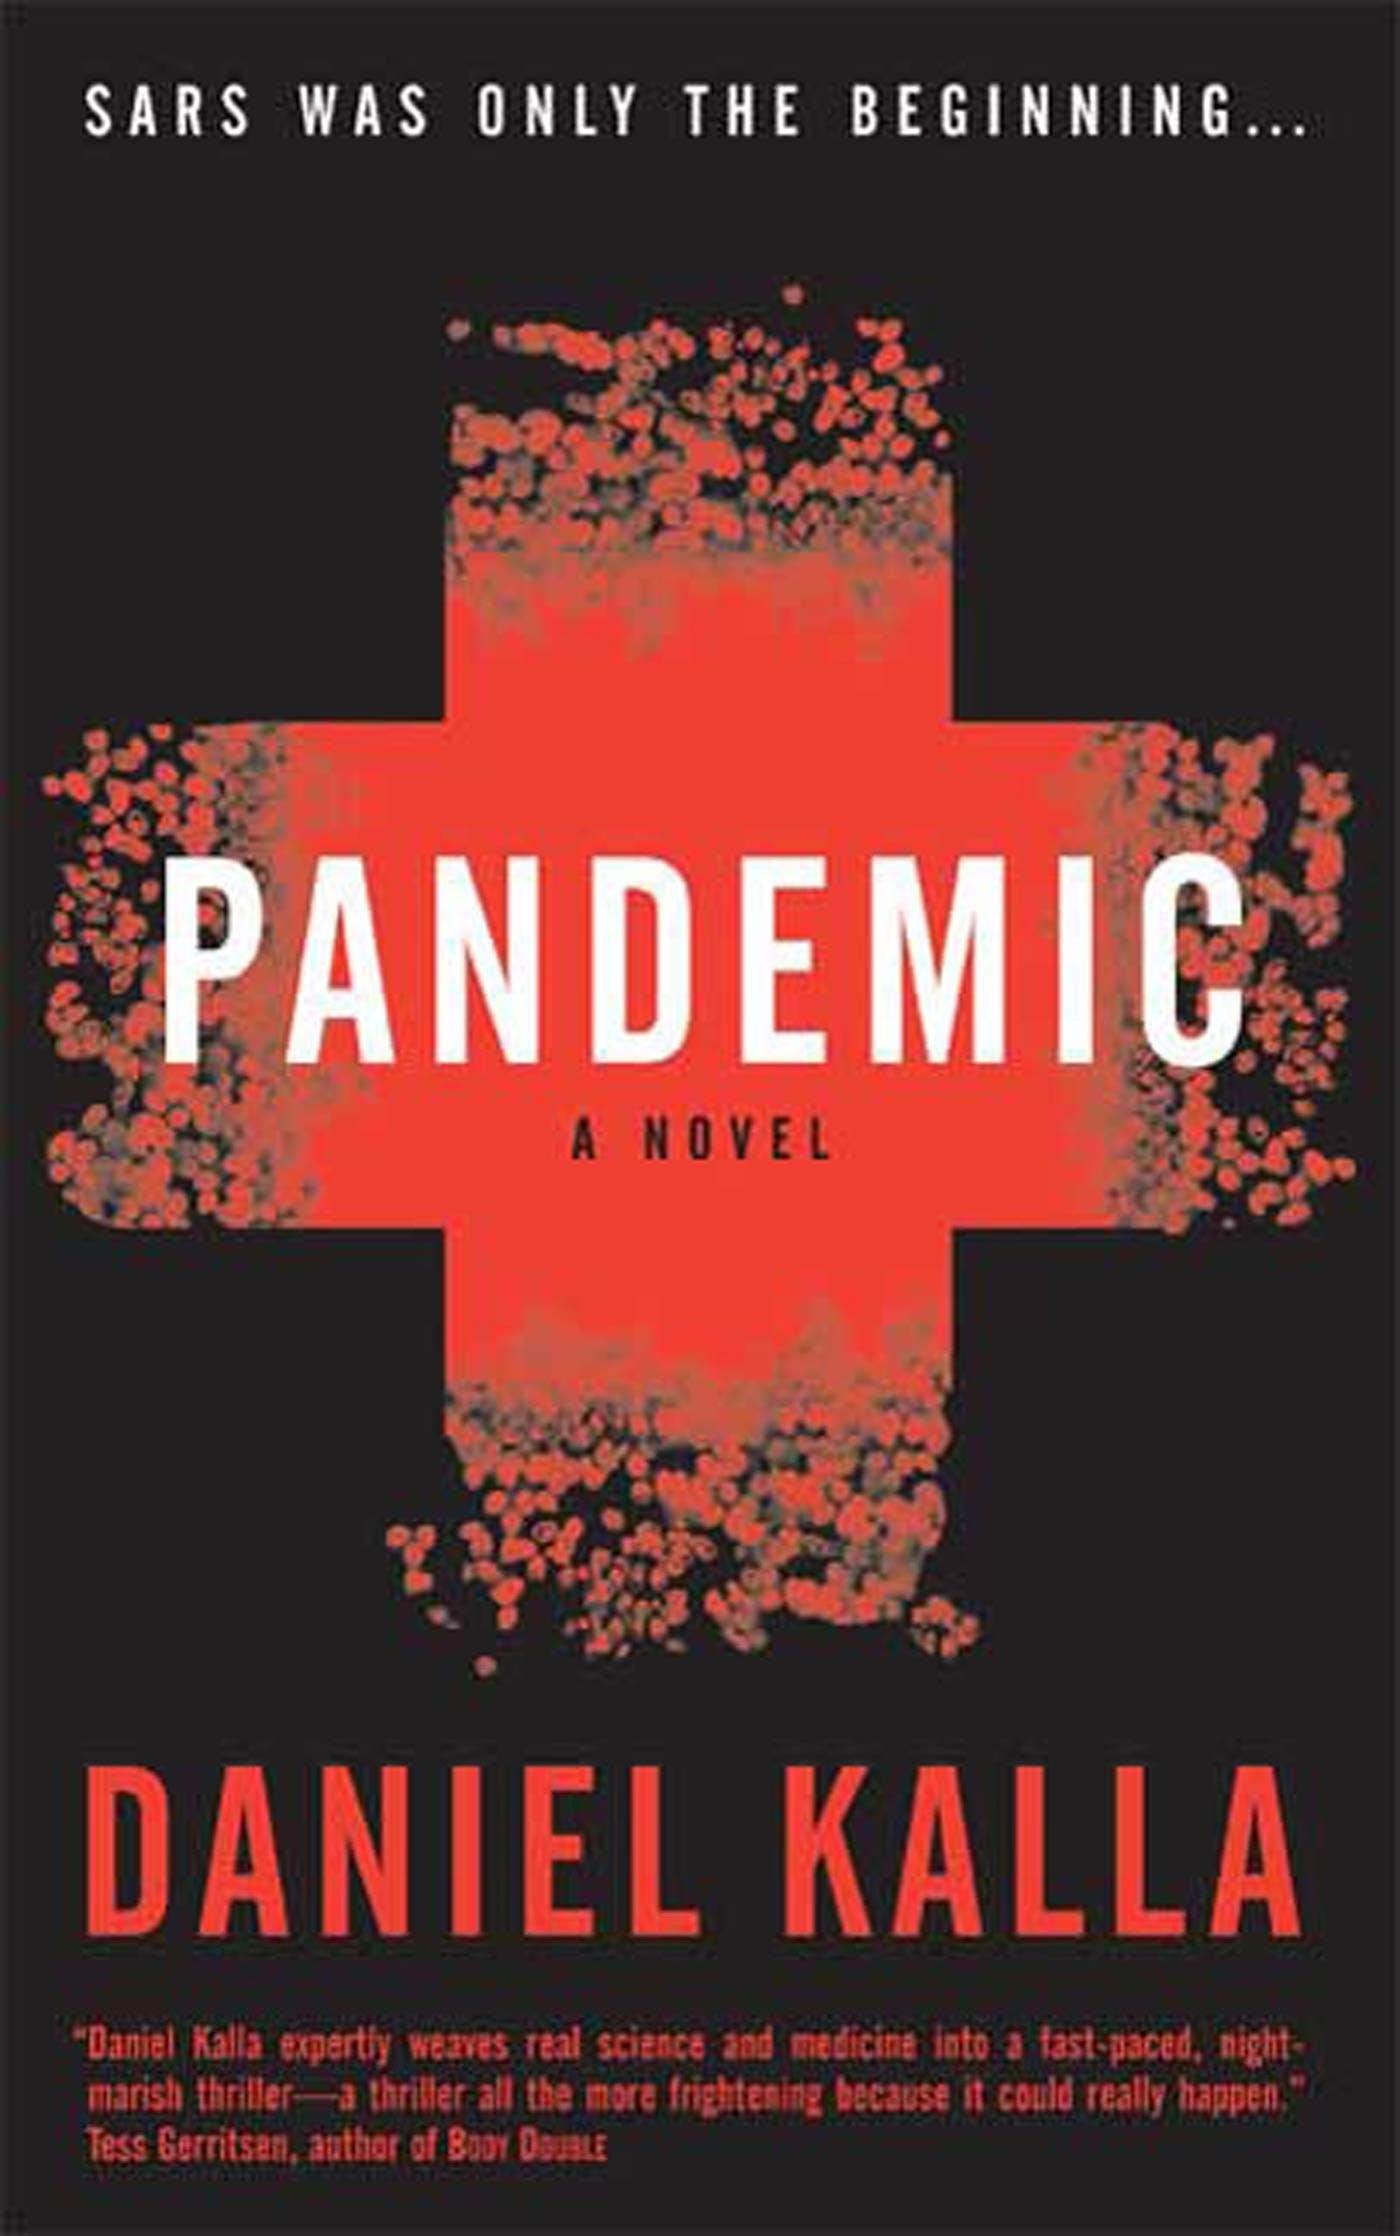 Image of Pandemic